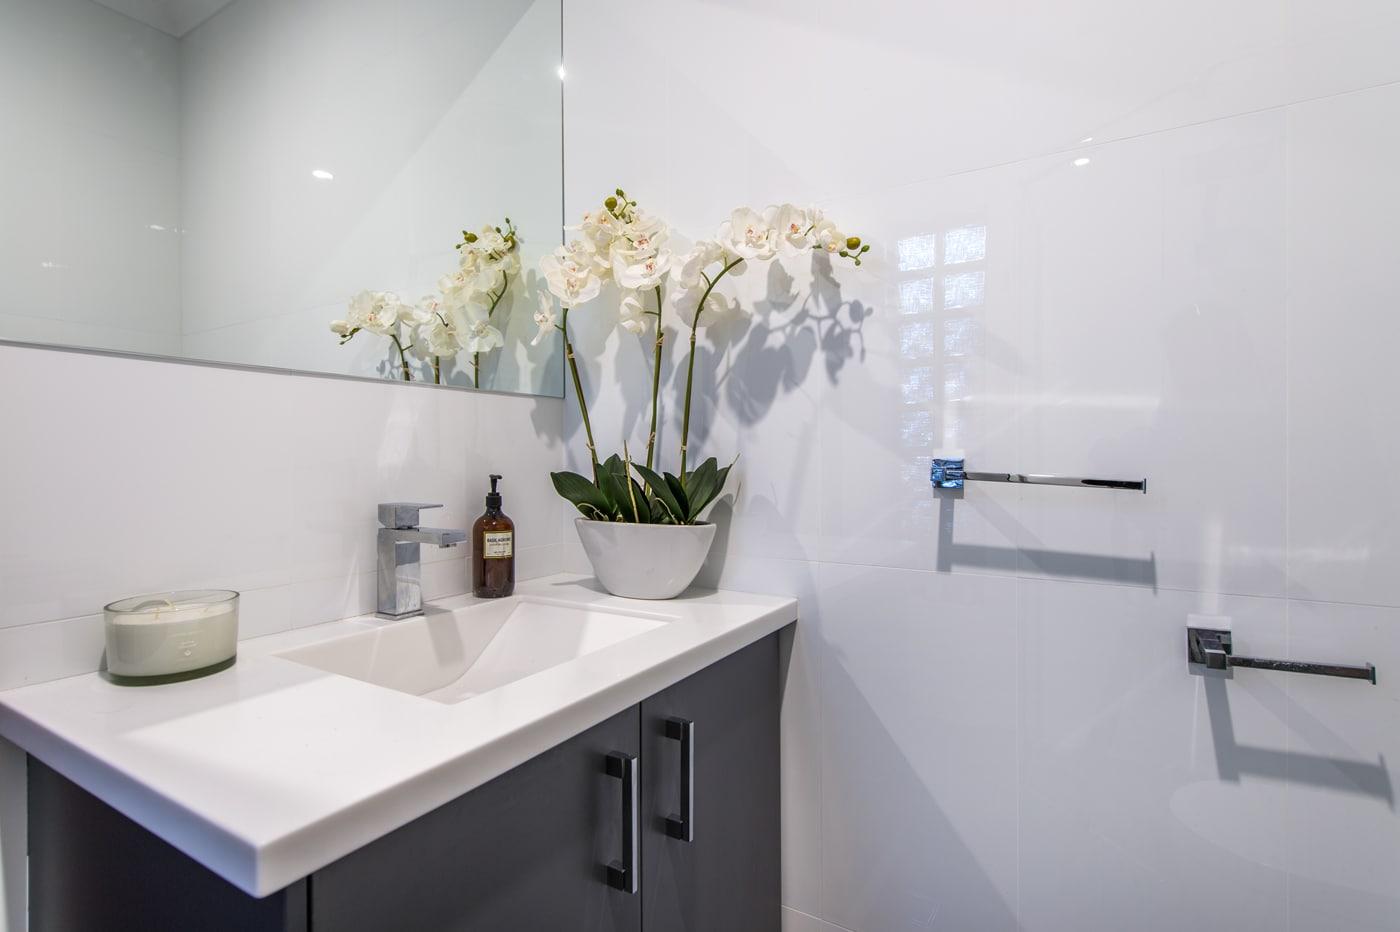 Italian Style Ceramic Tiles - Bathroom Renovations & Designs - 58 ...